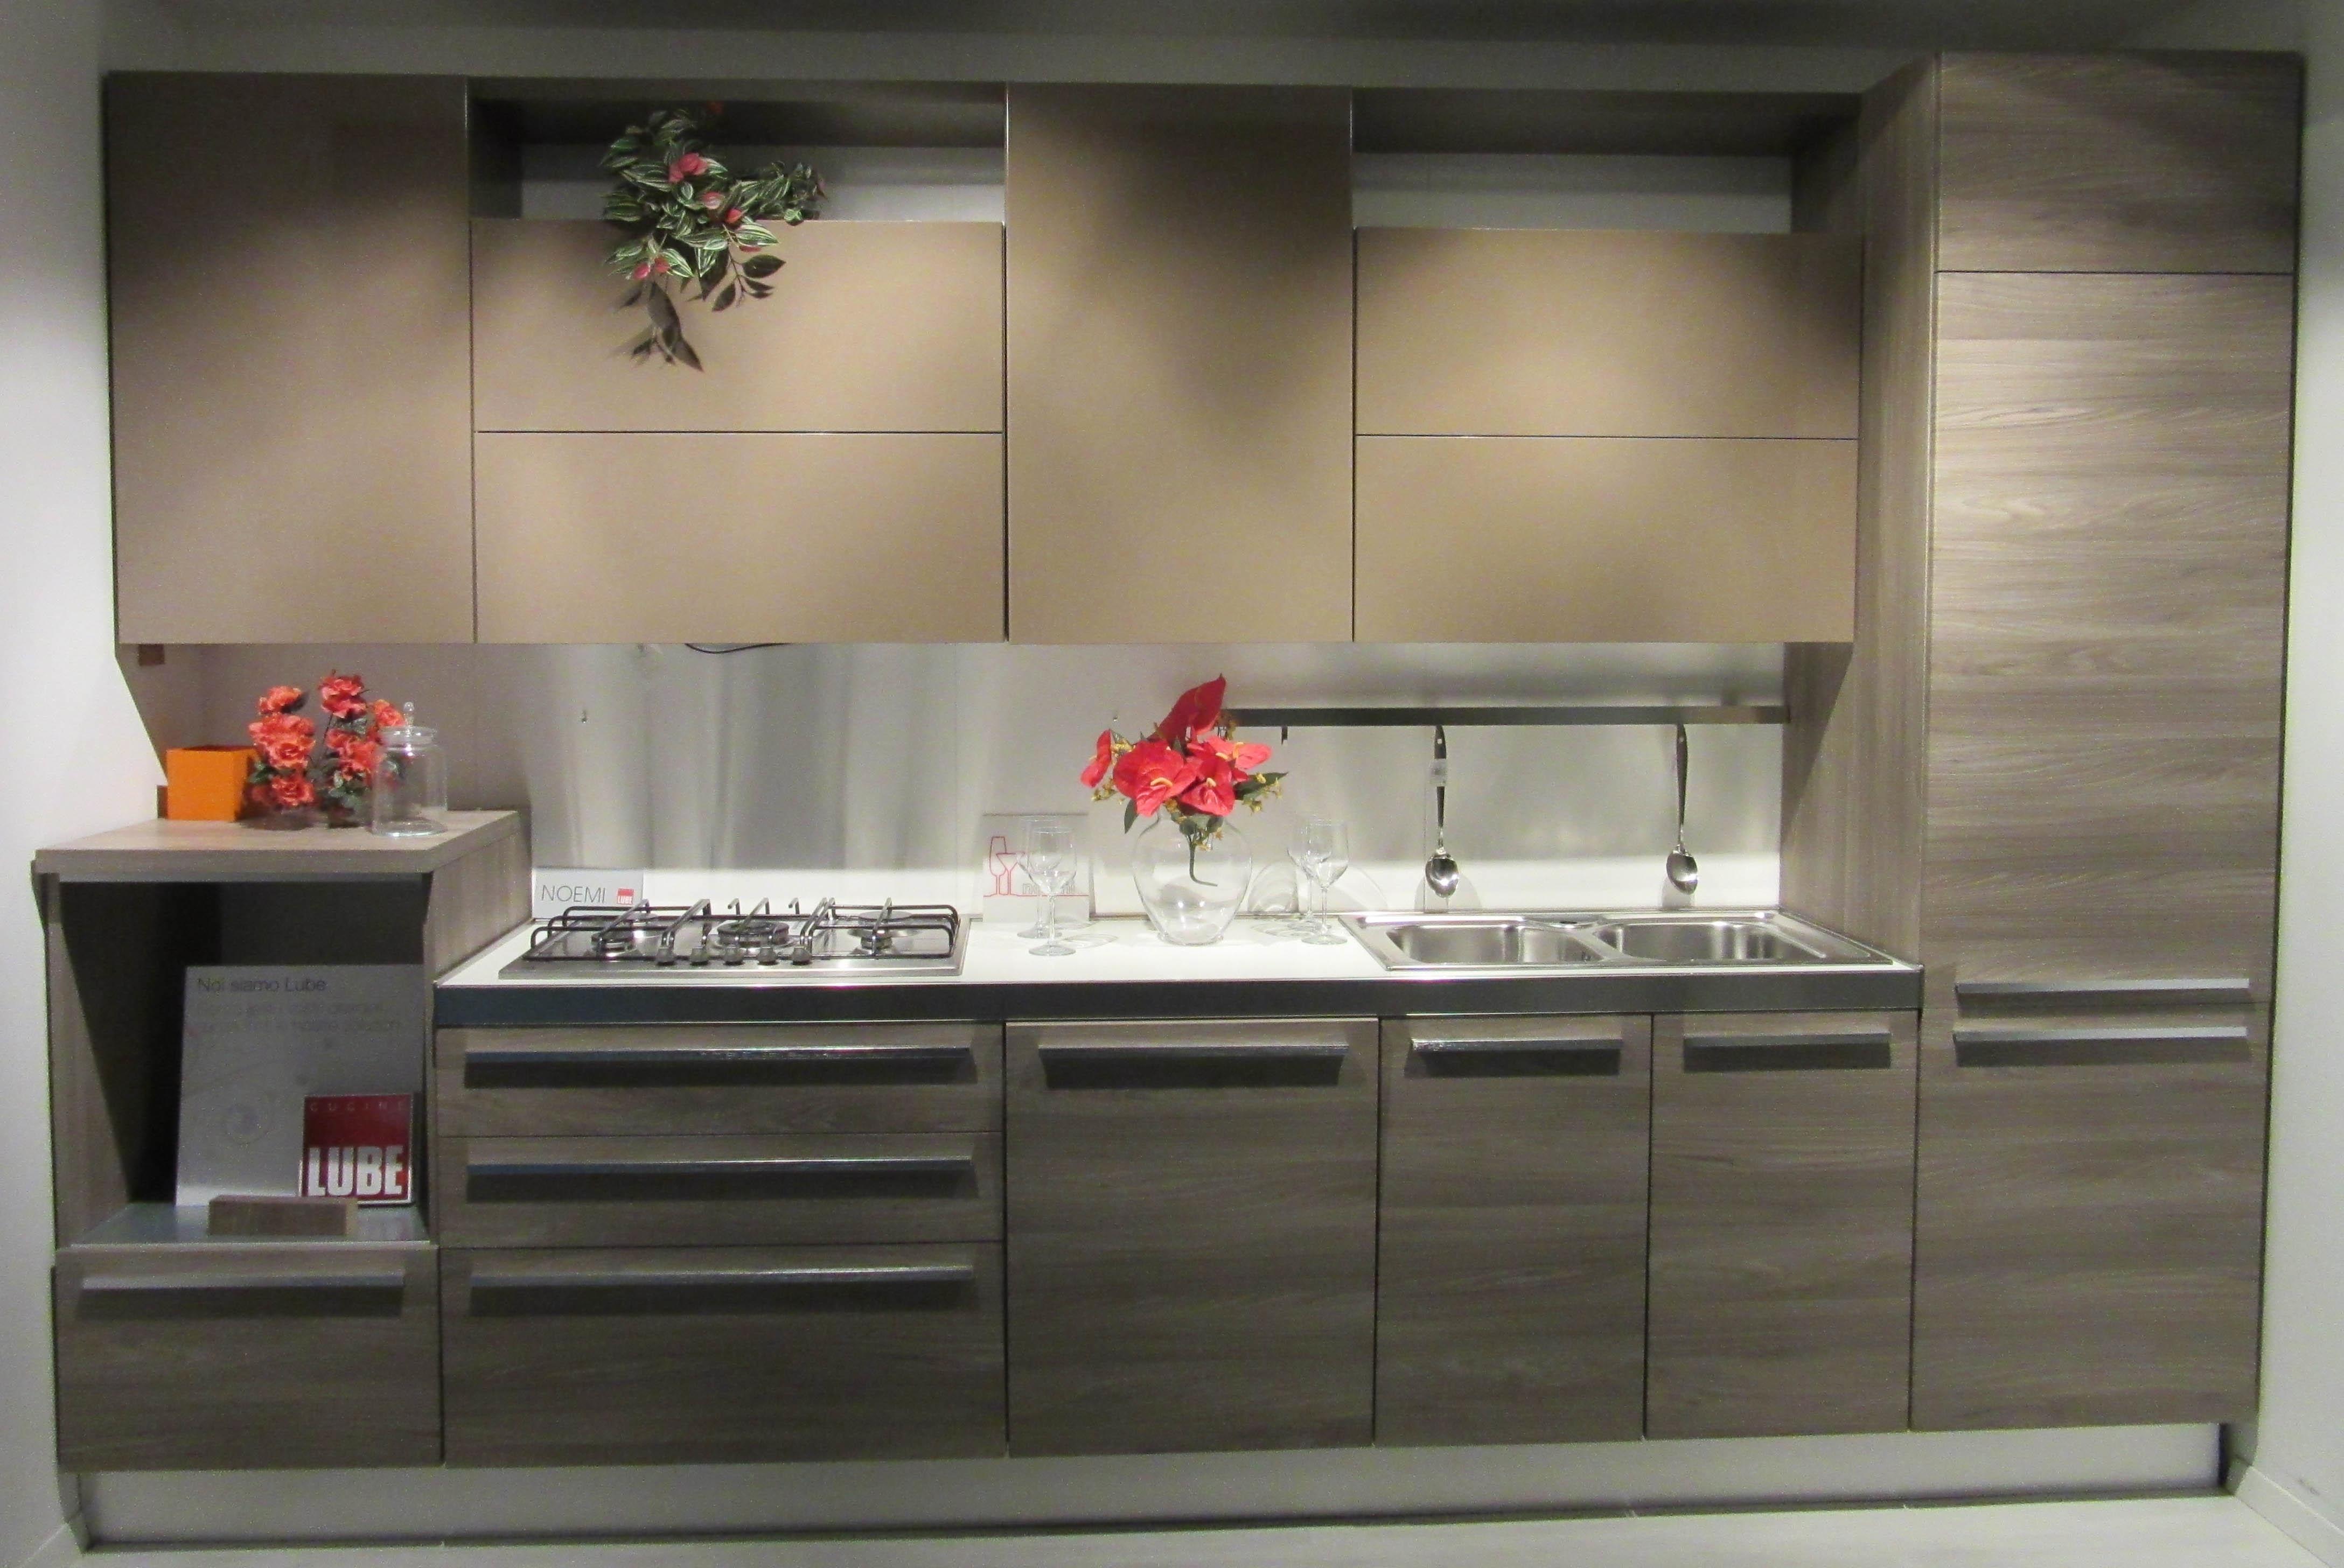 Da sala piccola pranzo ispirazioni - Altezza pensili cucina da top ...